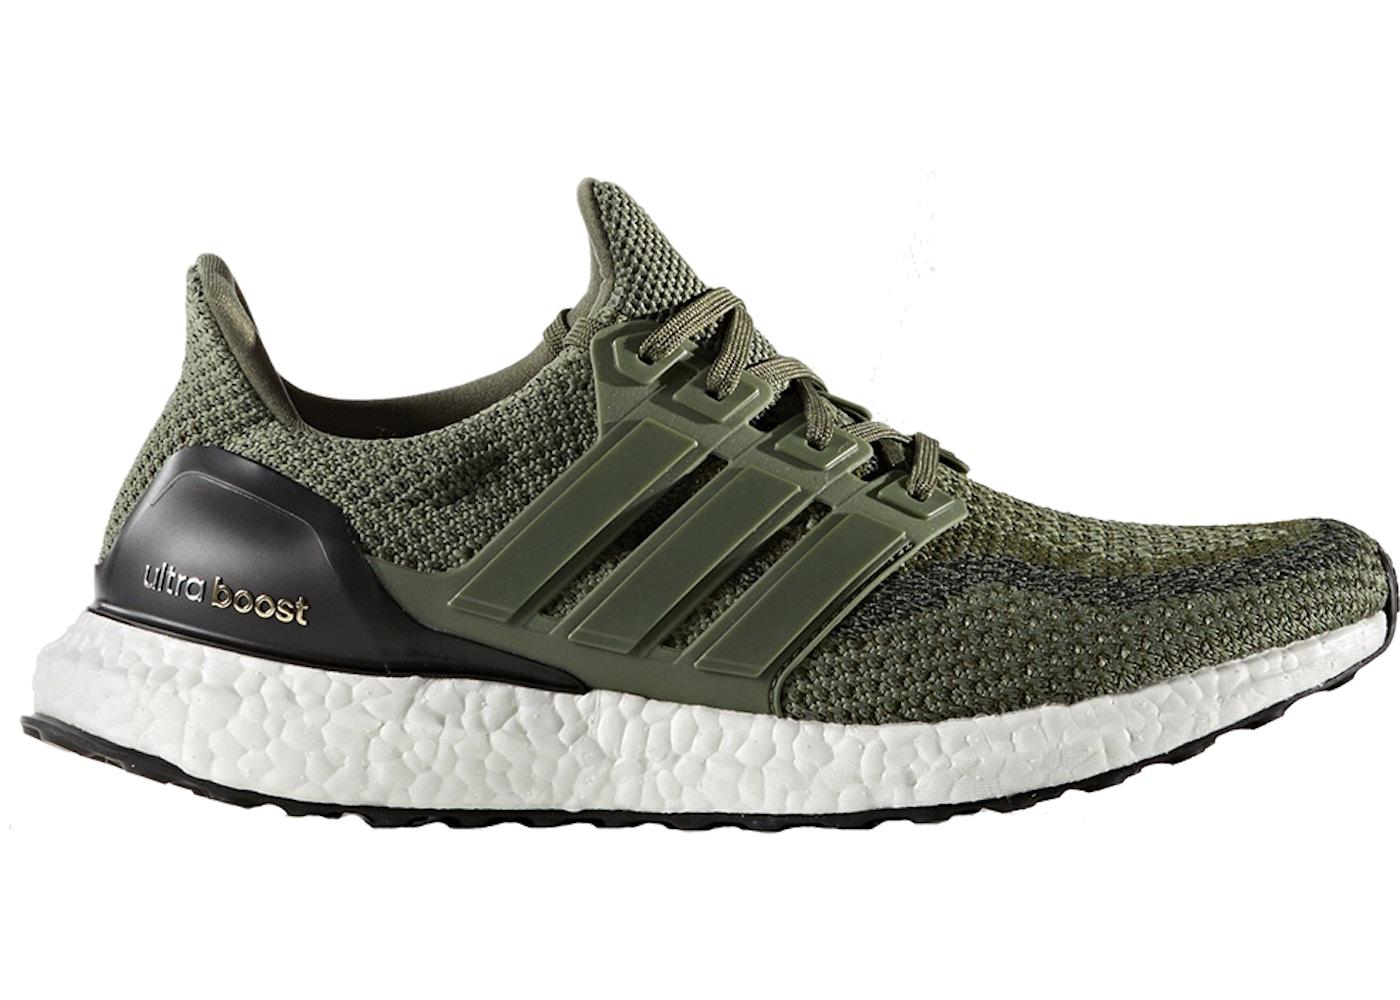 Adidas Ultra Boost M 2.0 Olive Merino Wool Size 10